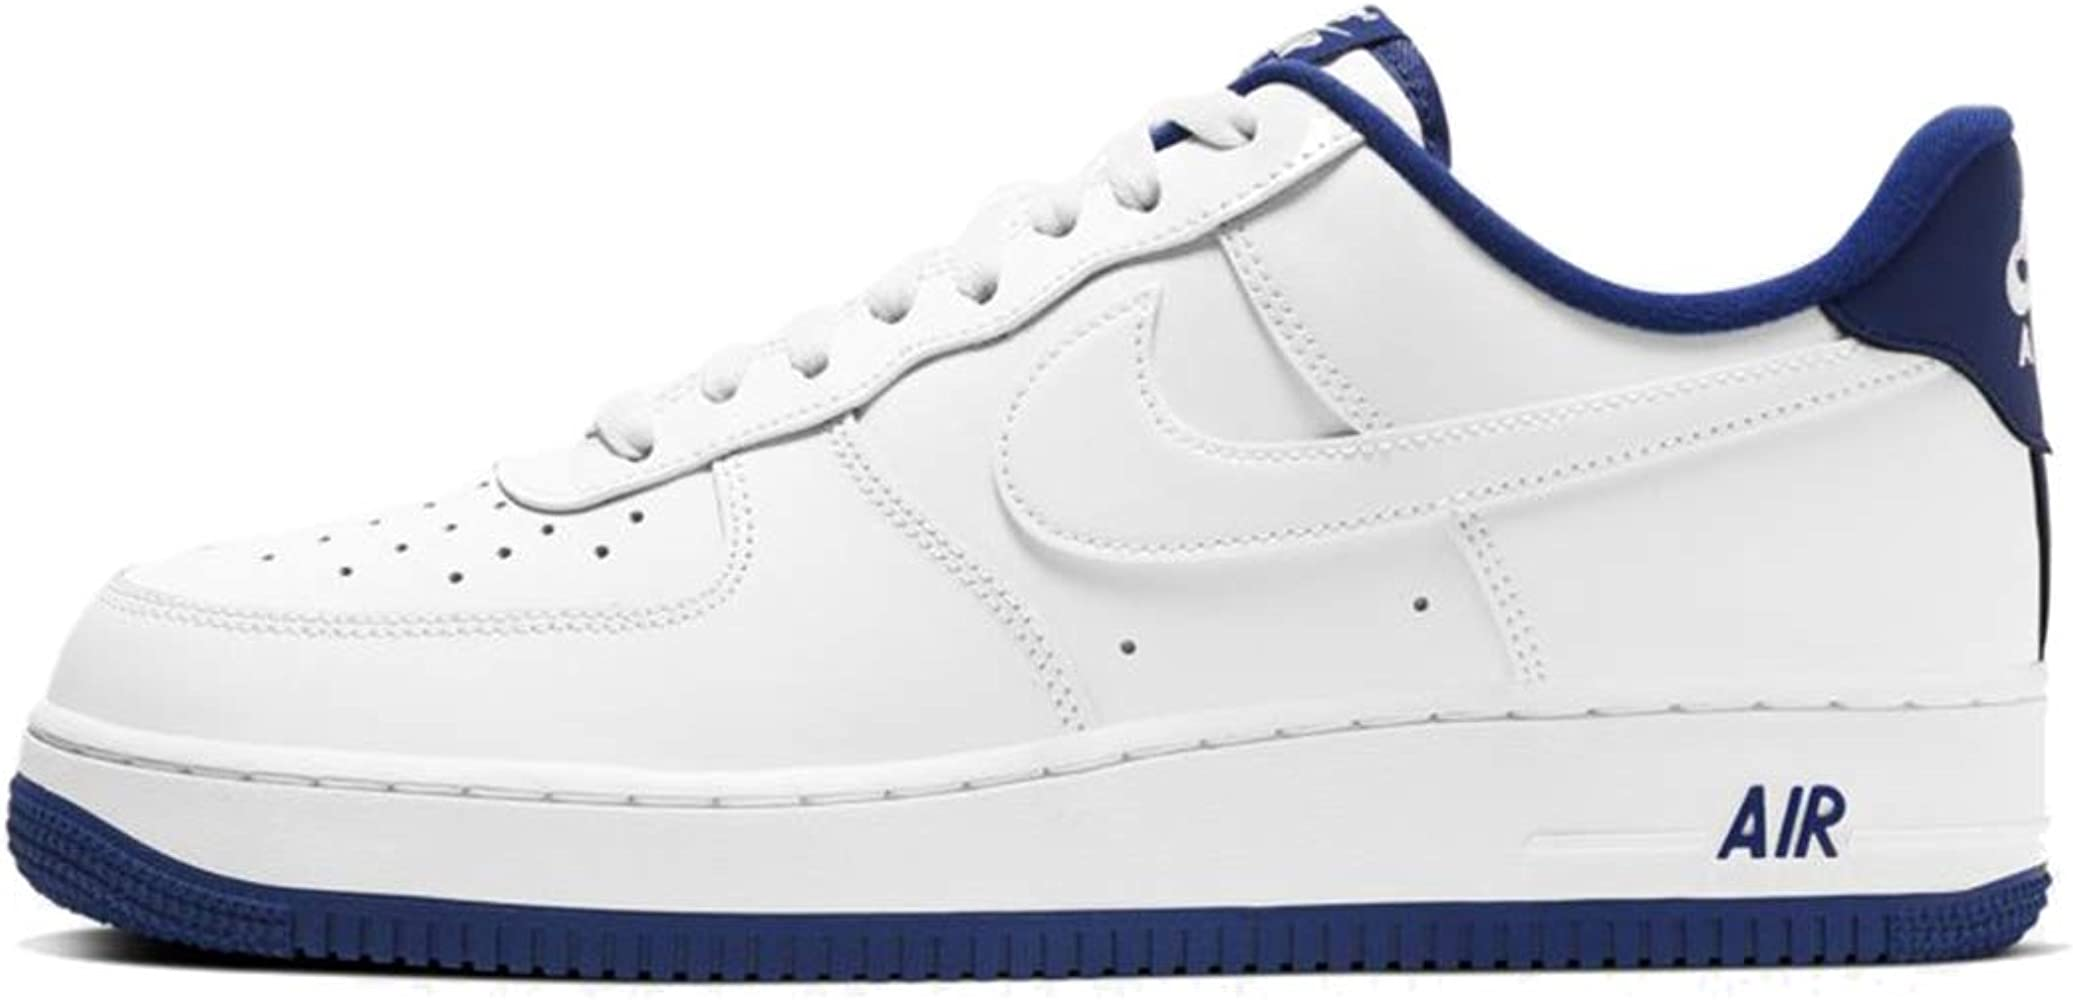 Mens Air Force 1 '07 White/Deep Royal Blue/White CD0884-102 Size 11.5